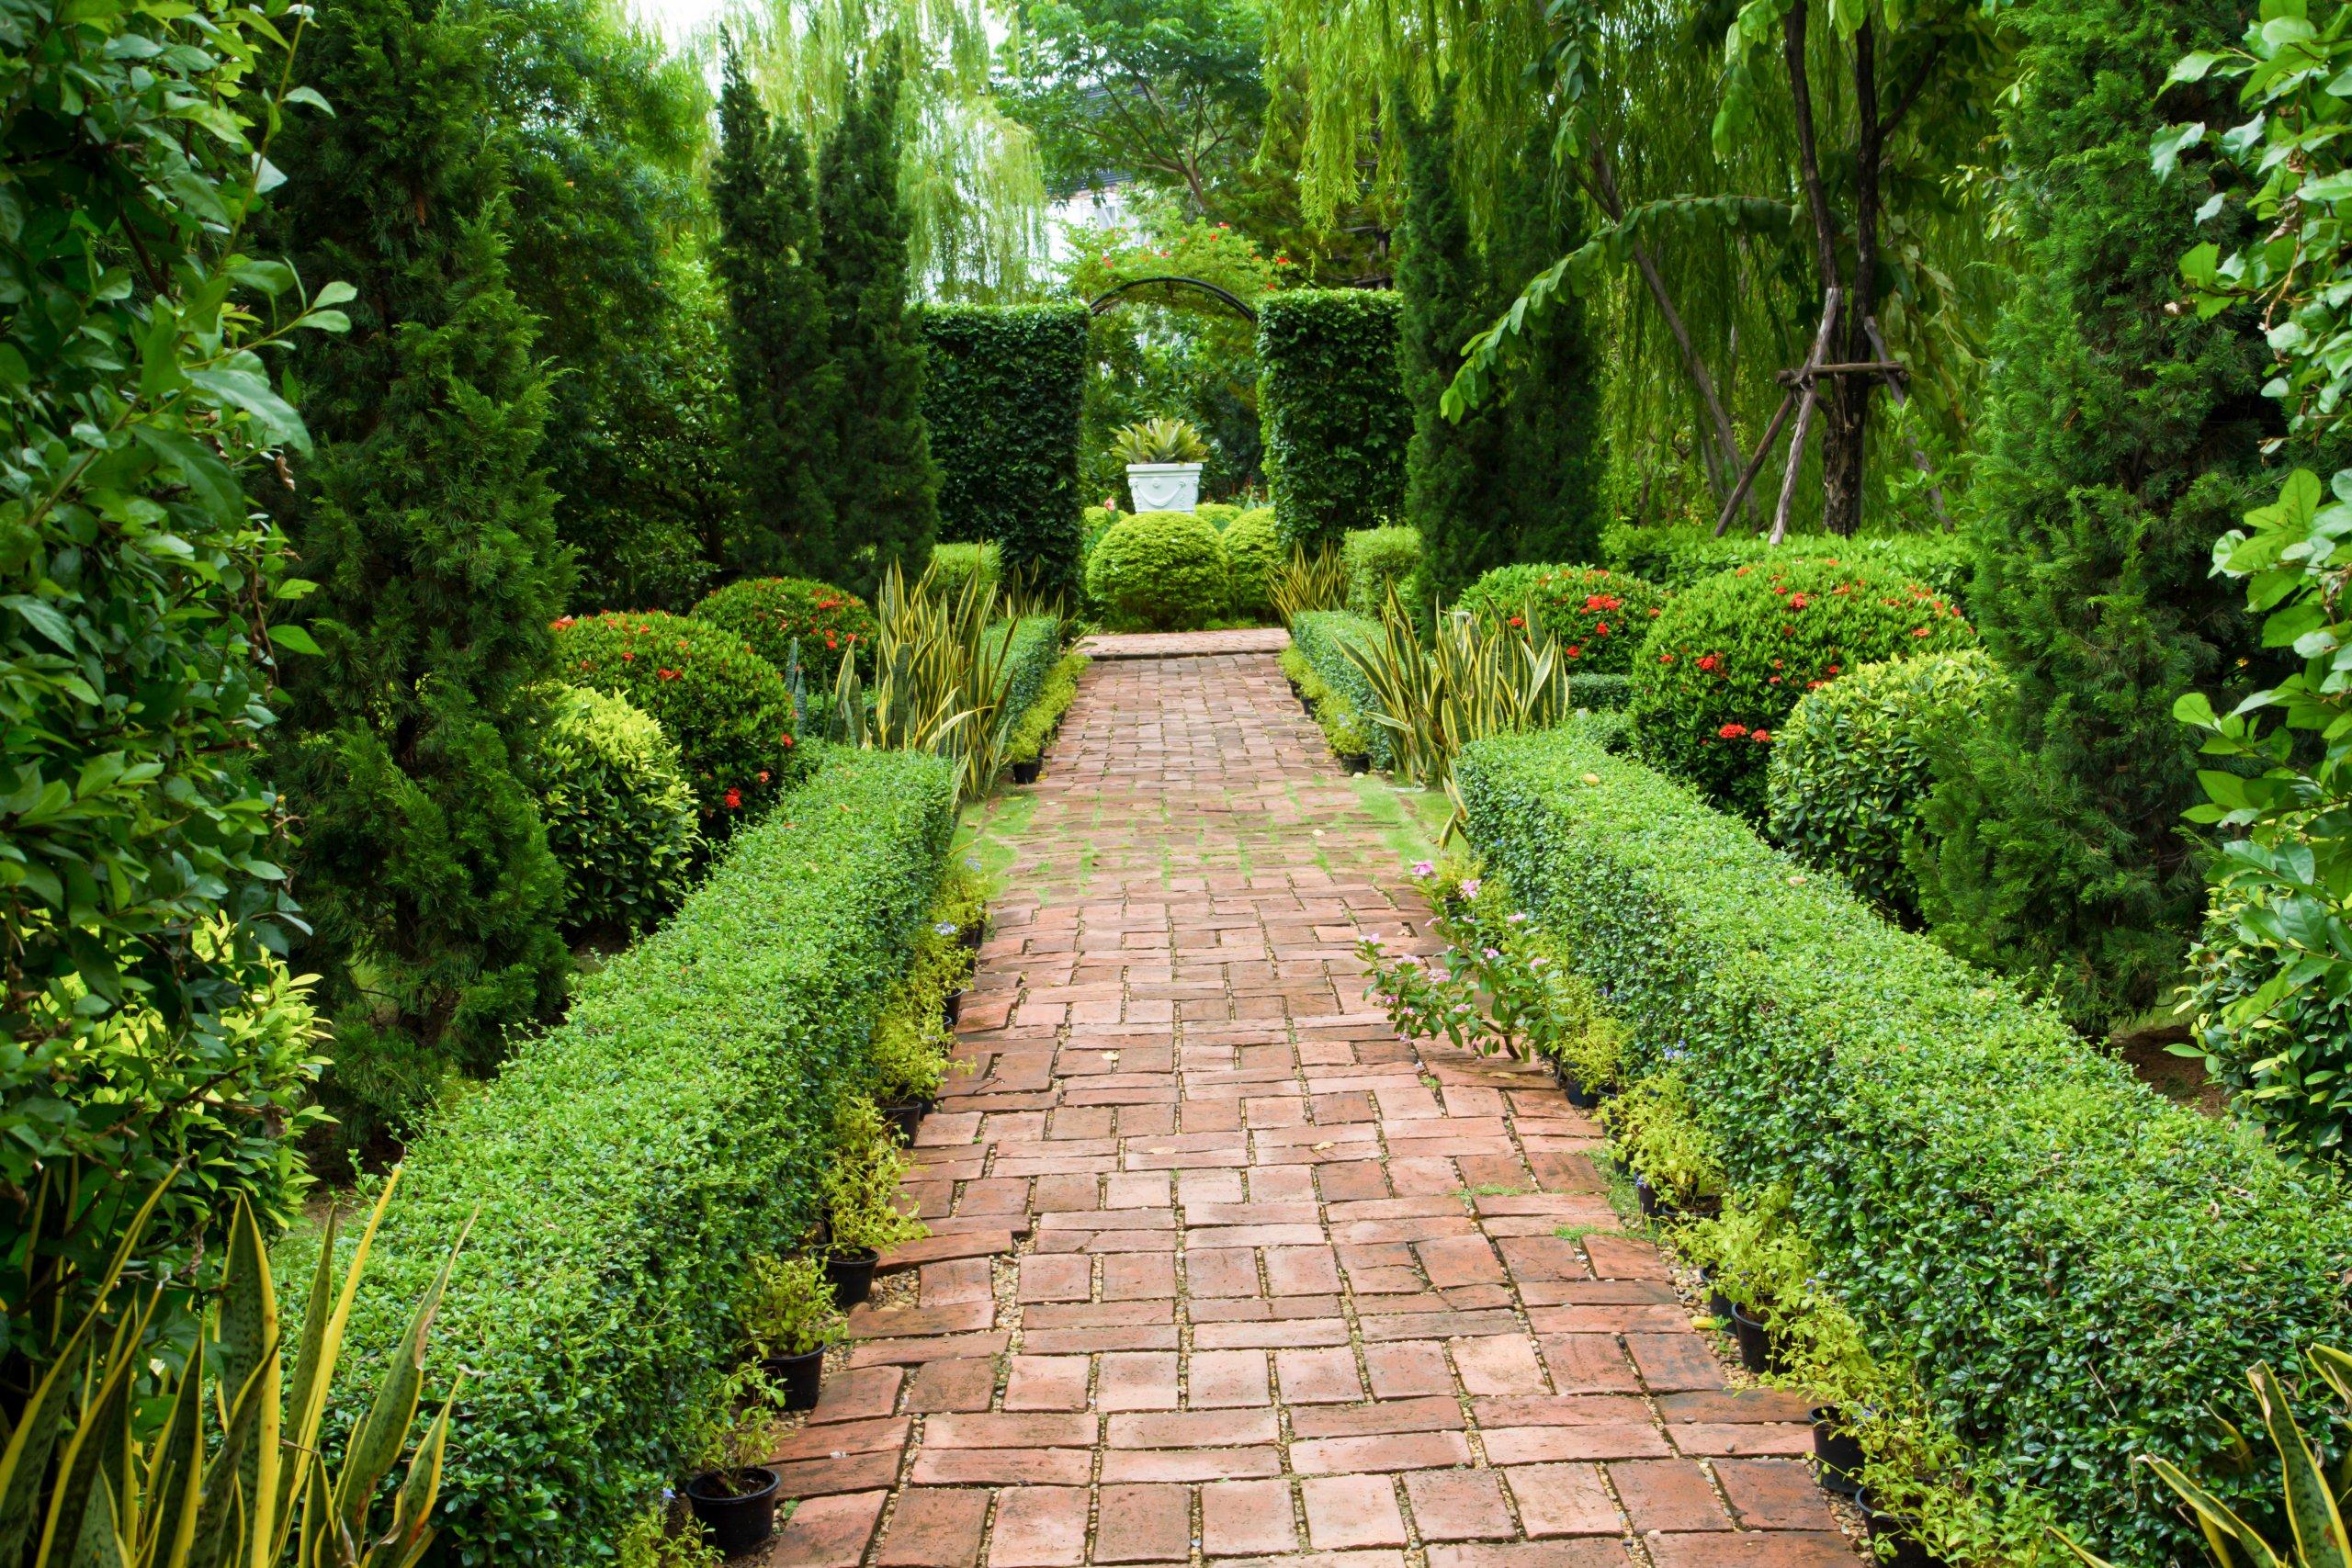 Buchsbaum als Wegrand im Garten